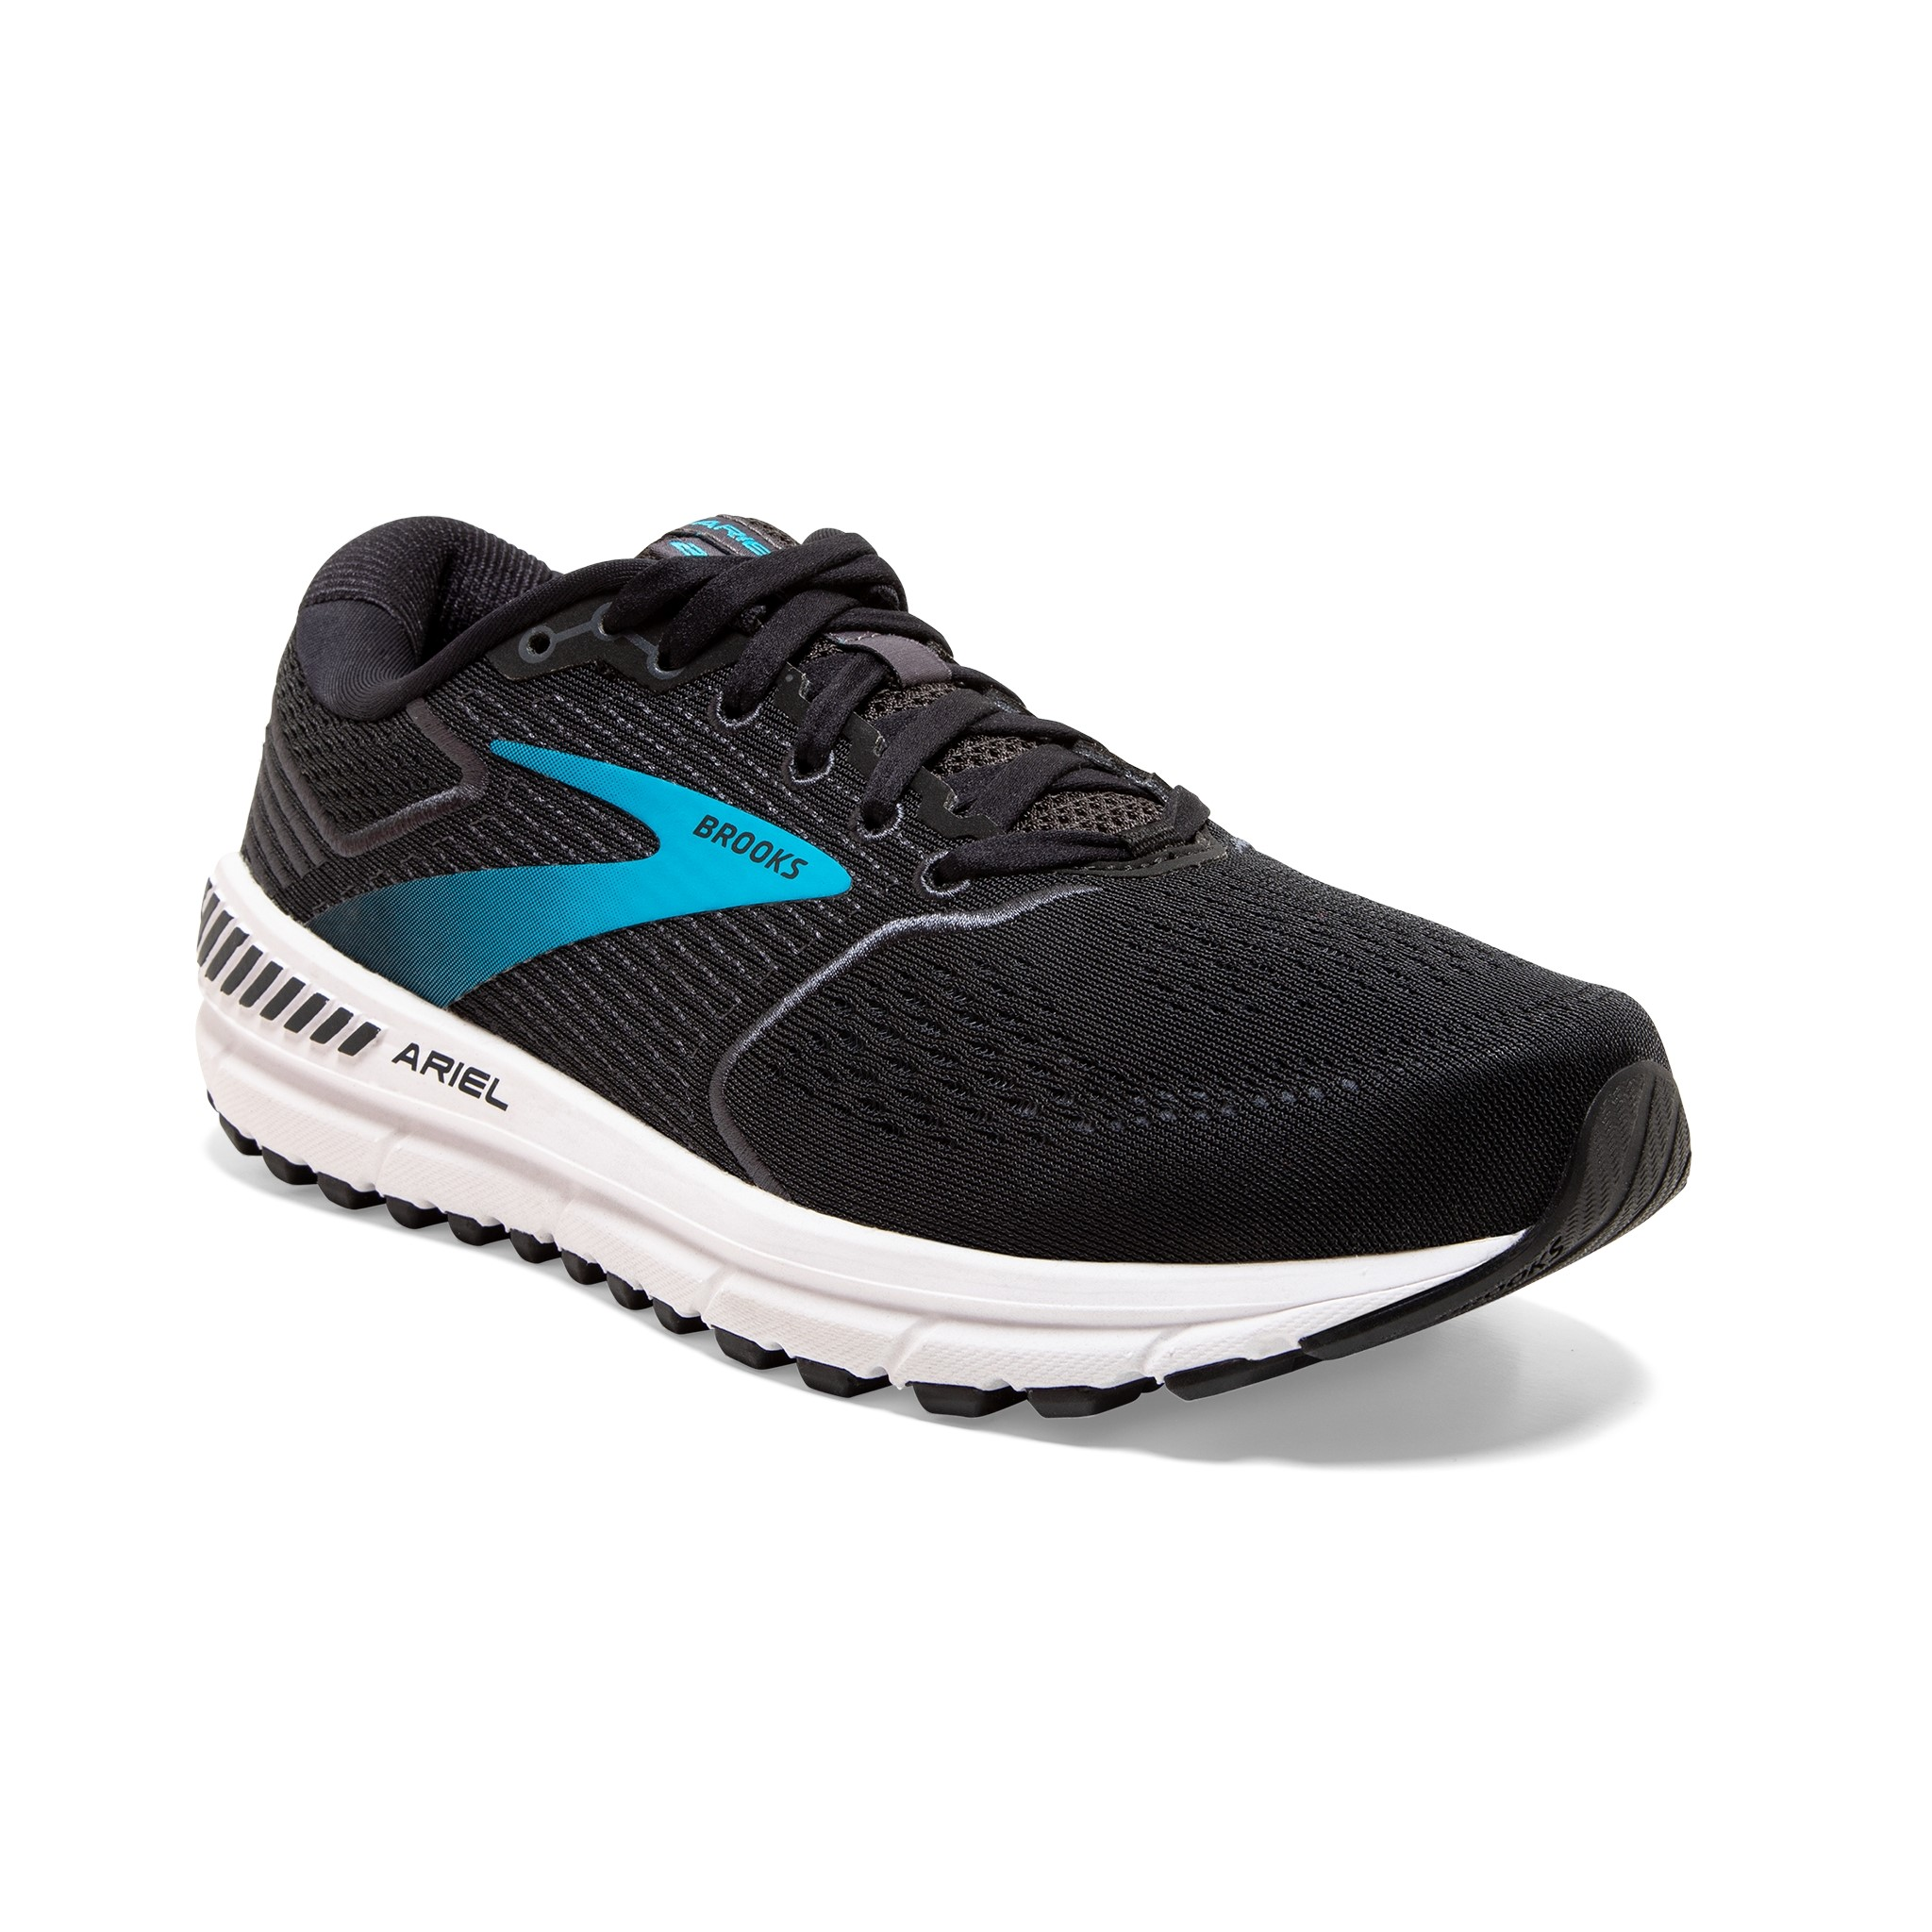 2E Black//Ebony//Blue 11.5 Brooks Womens Ariel 20 Running Shoe